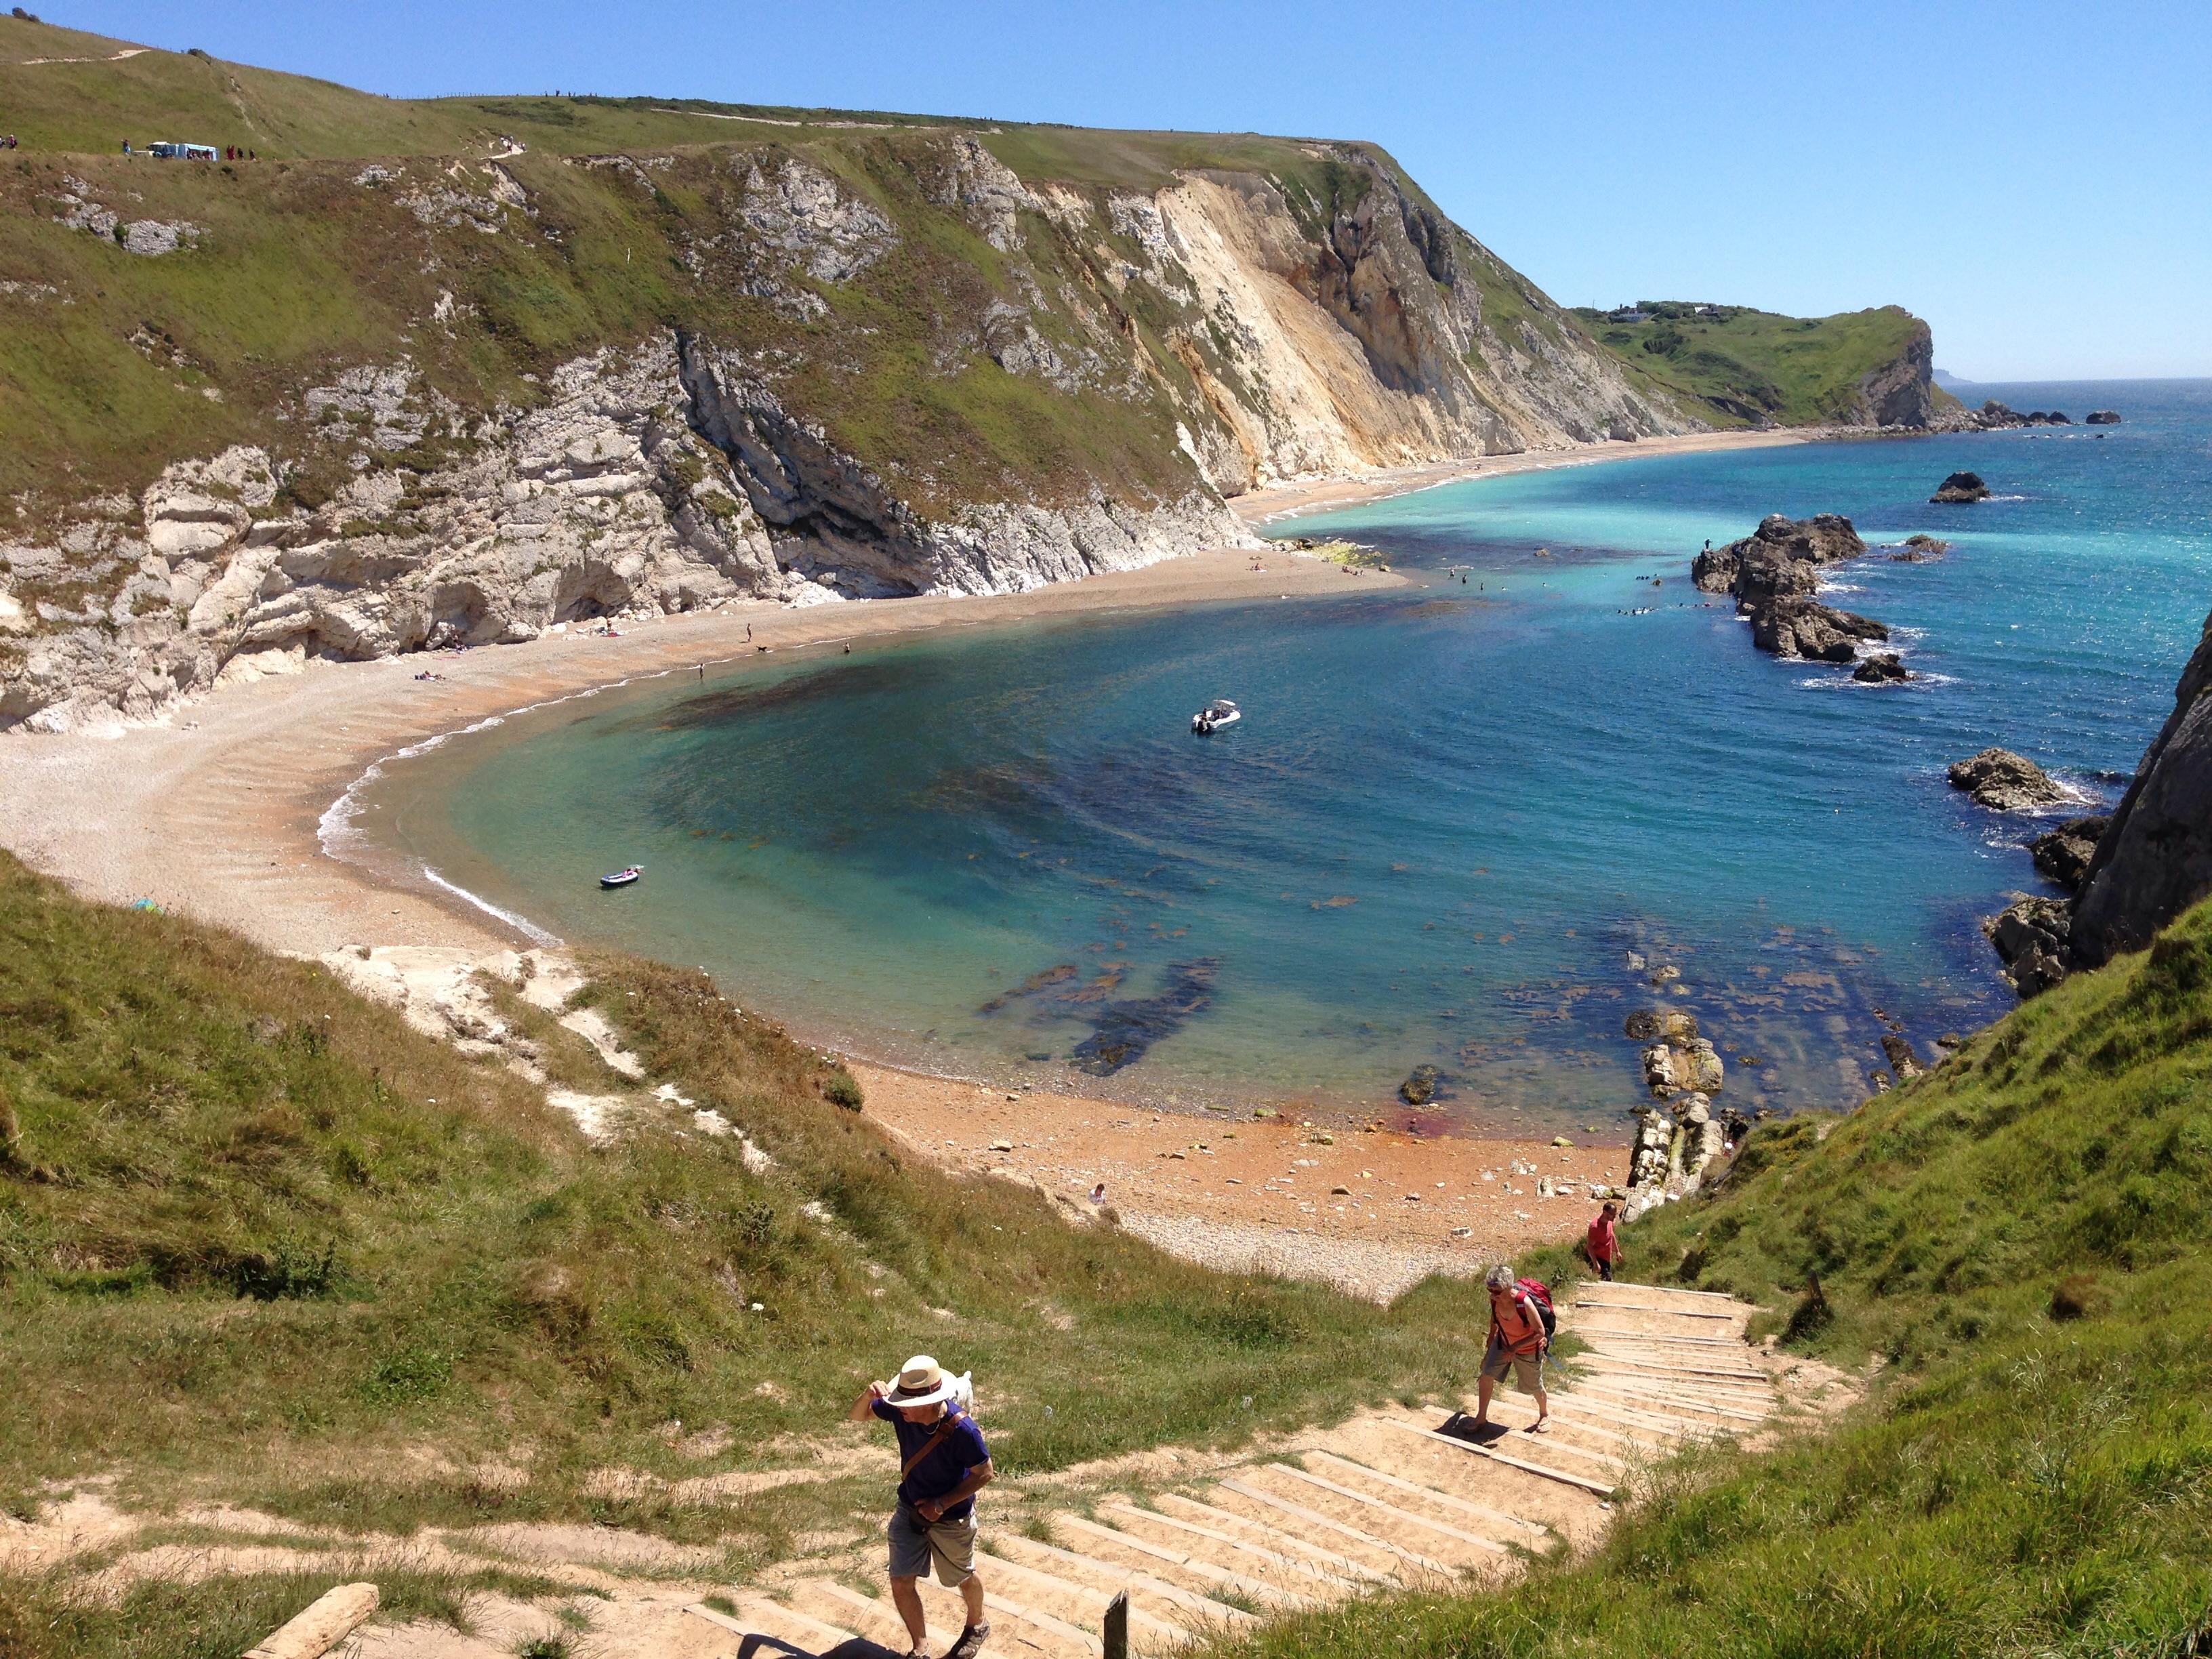 The Dorset Jurassic Coast